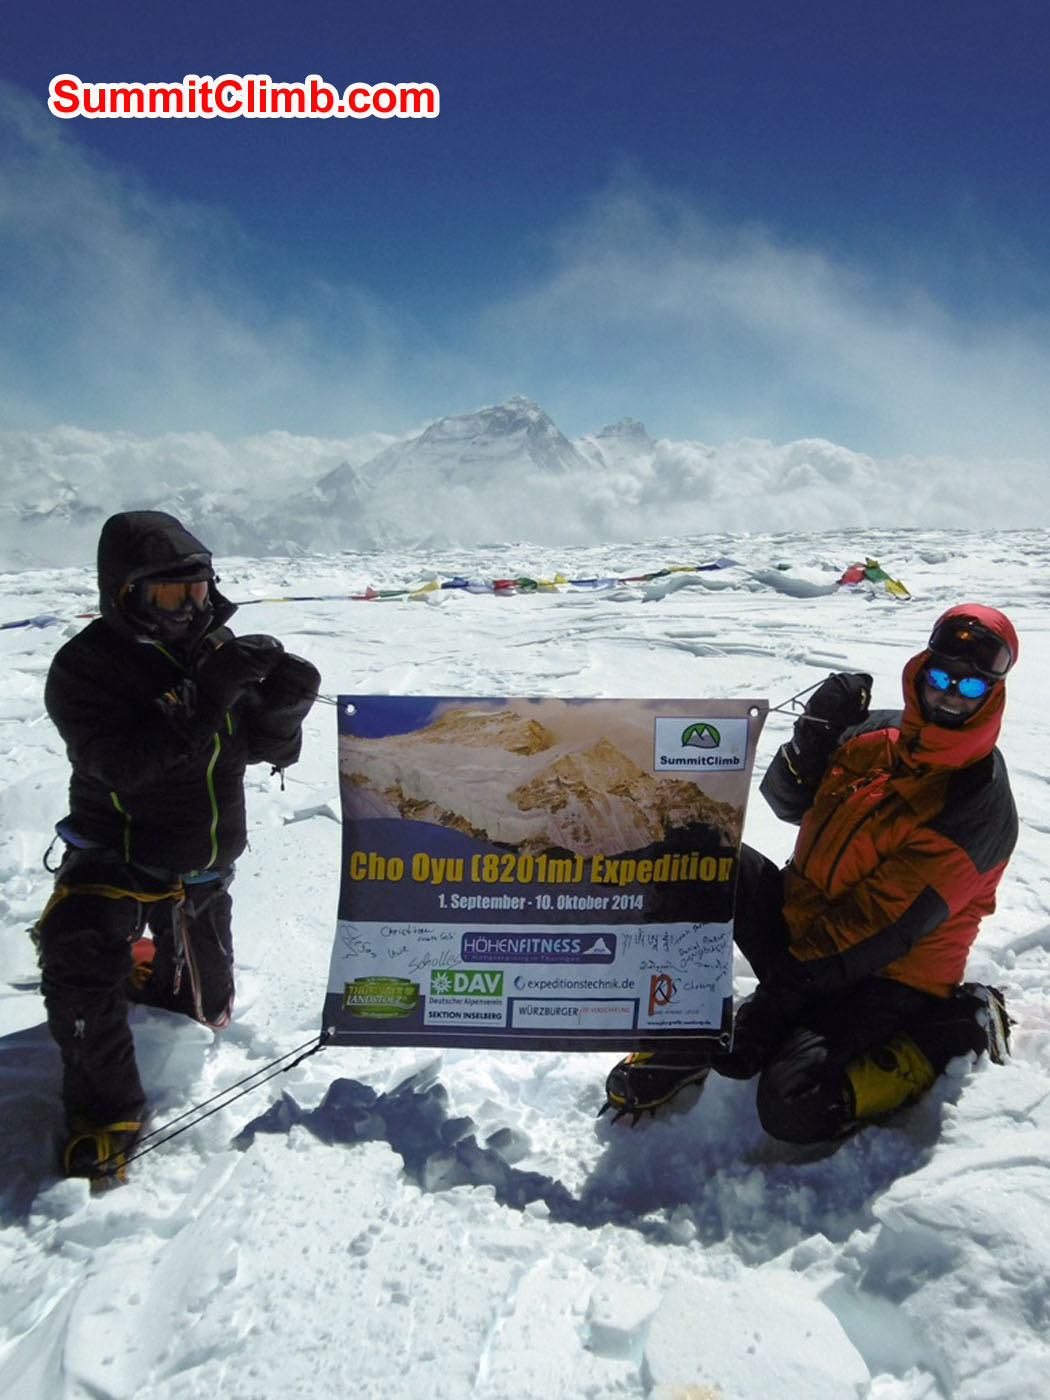 Thomas and Stefan on the summit of Cho Oyu. Uwe Werner Photo